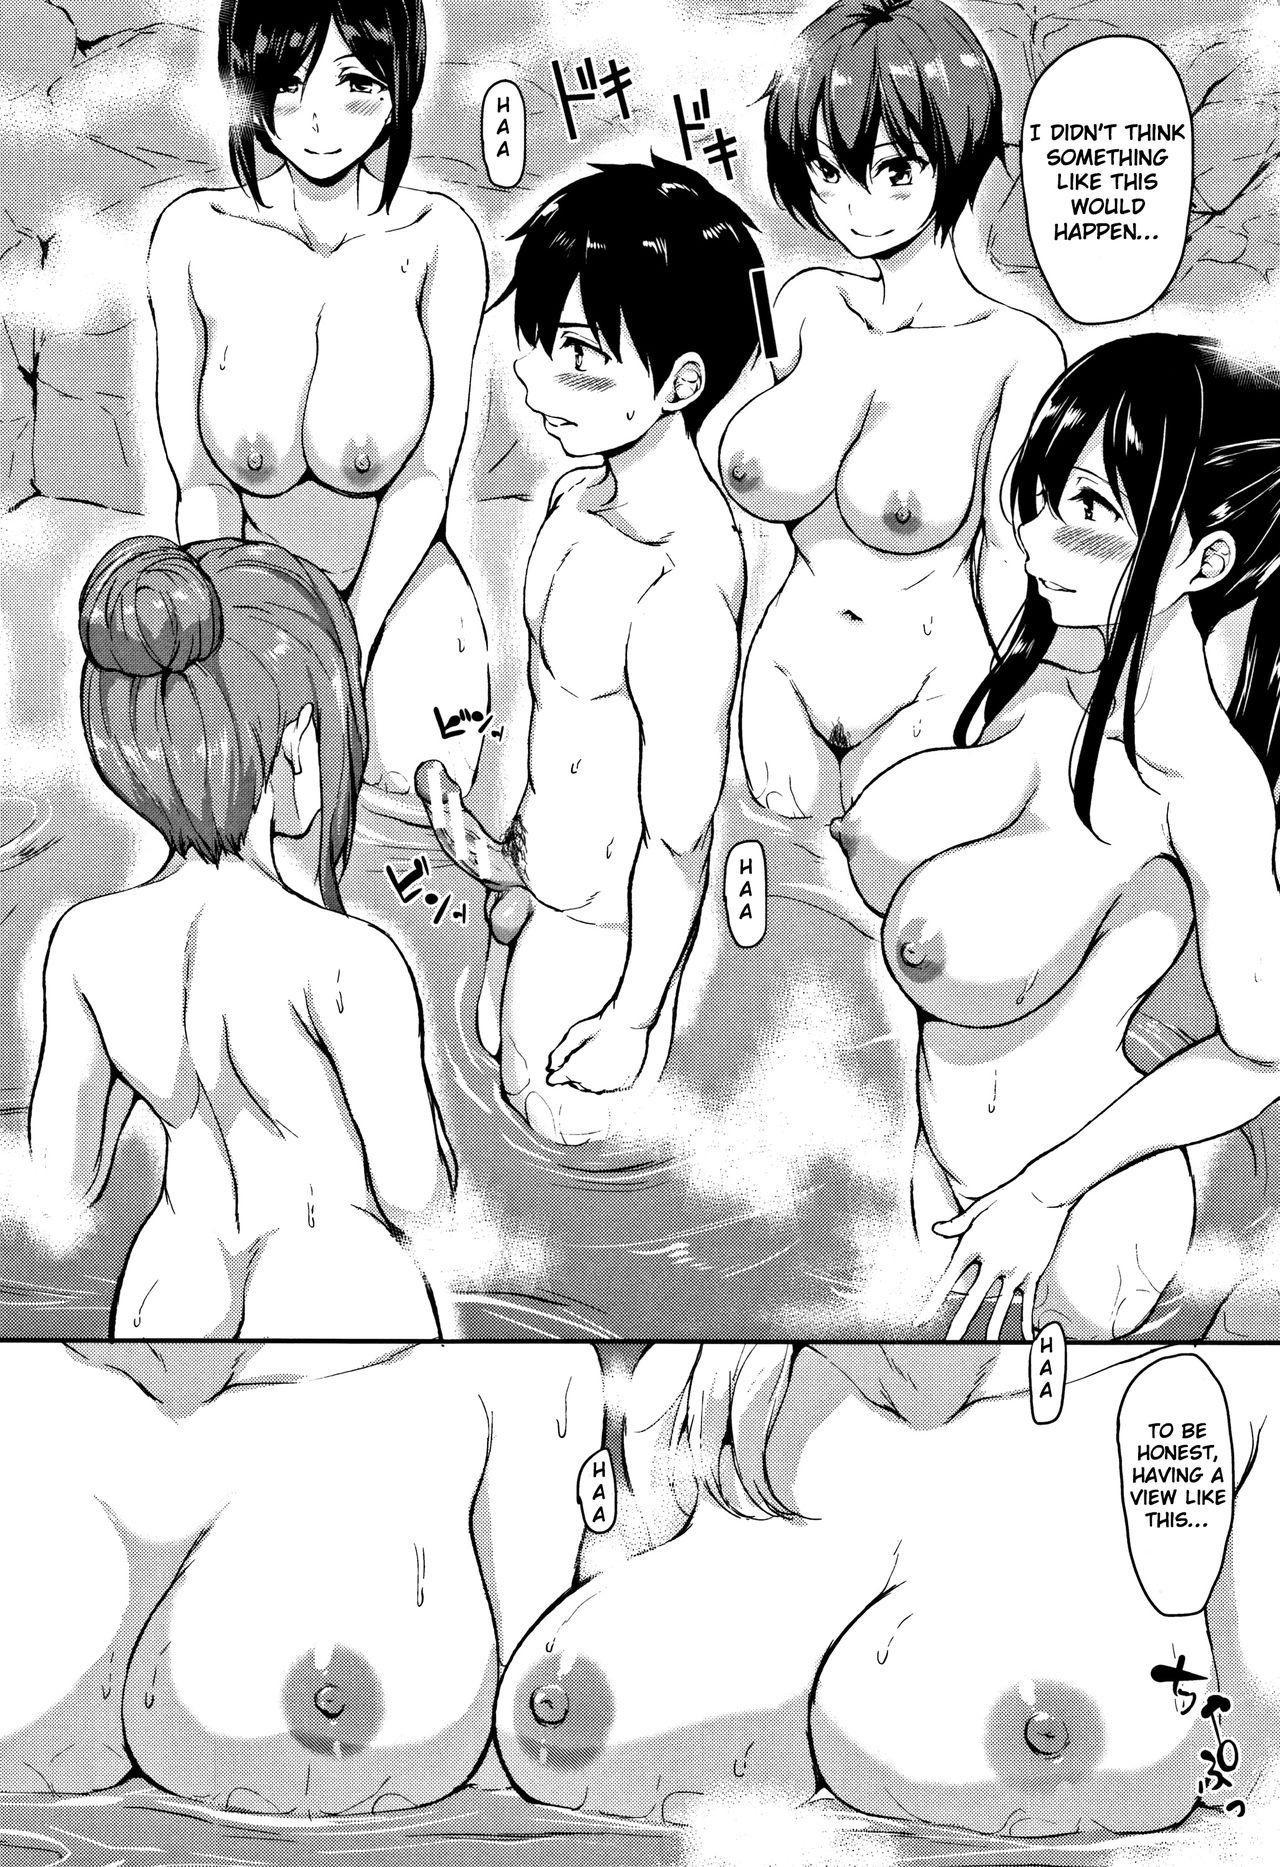 Yukemuri Harem Monogatari Saishuuwa | Yukemuri Harem Monogatari Final Chapter 7